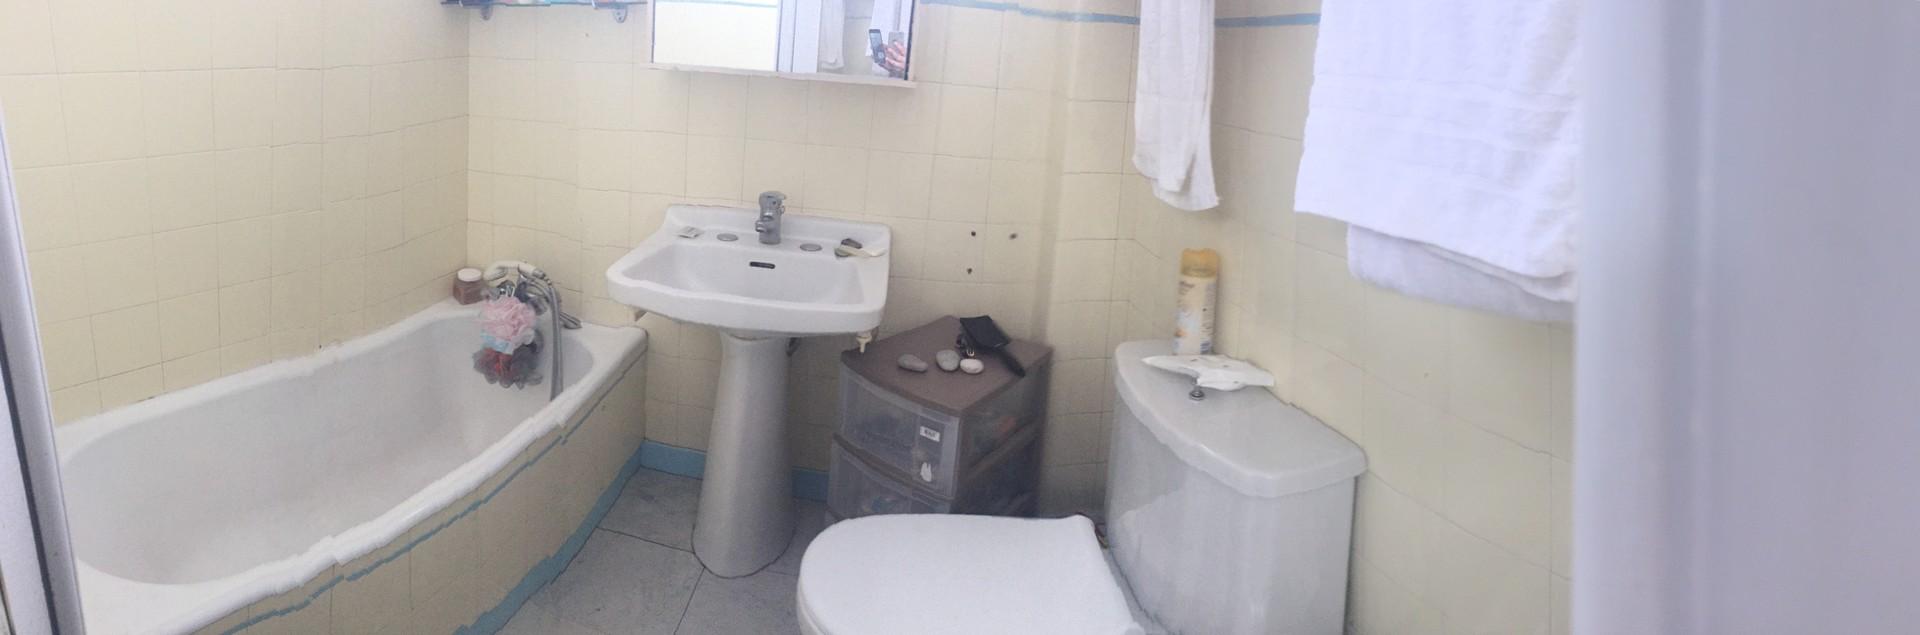 appartement-cosy-nice-35m-b6b7f33474af55